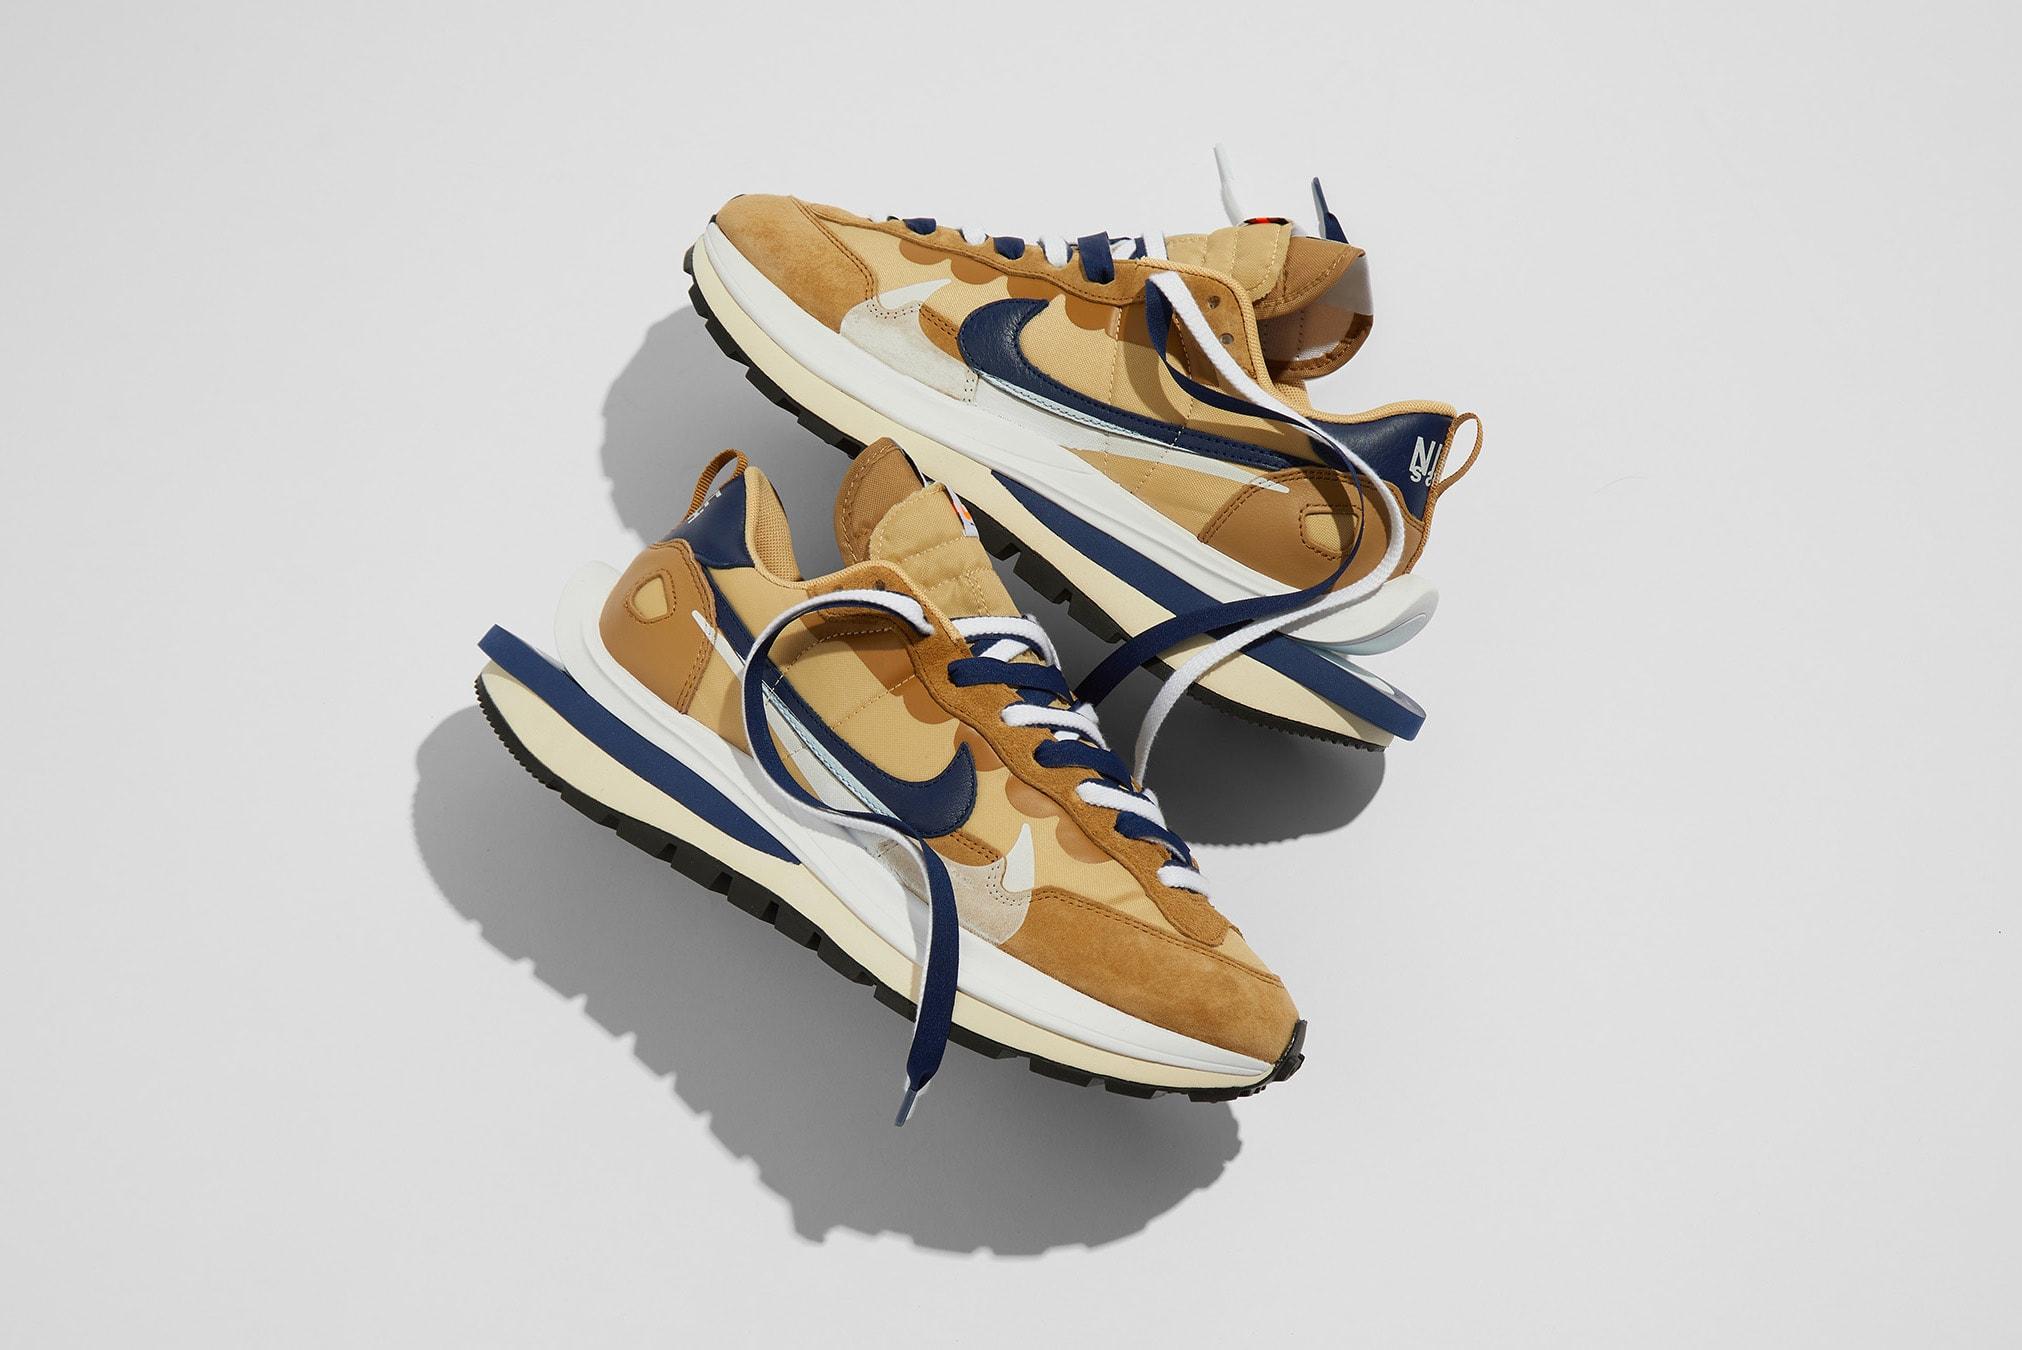 Nike x Sacai Vaporwaffle - DD1875-200